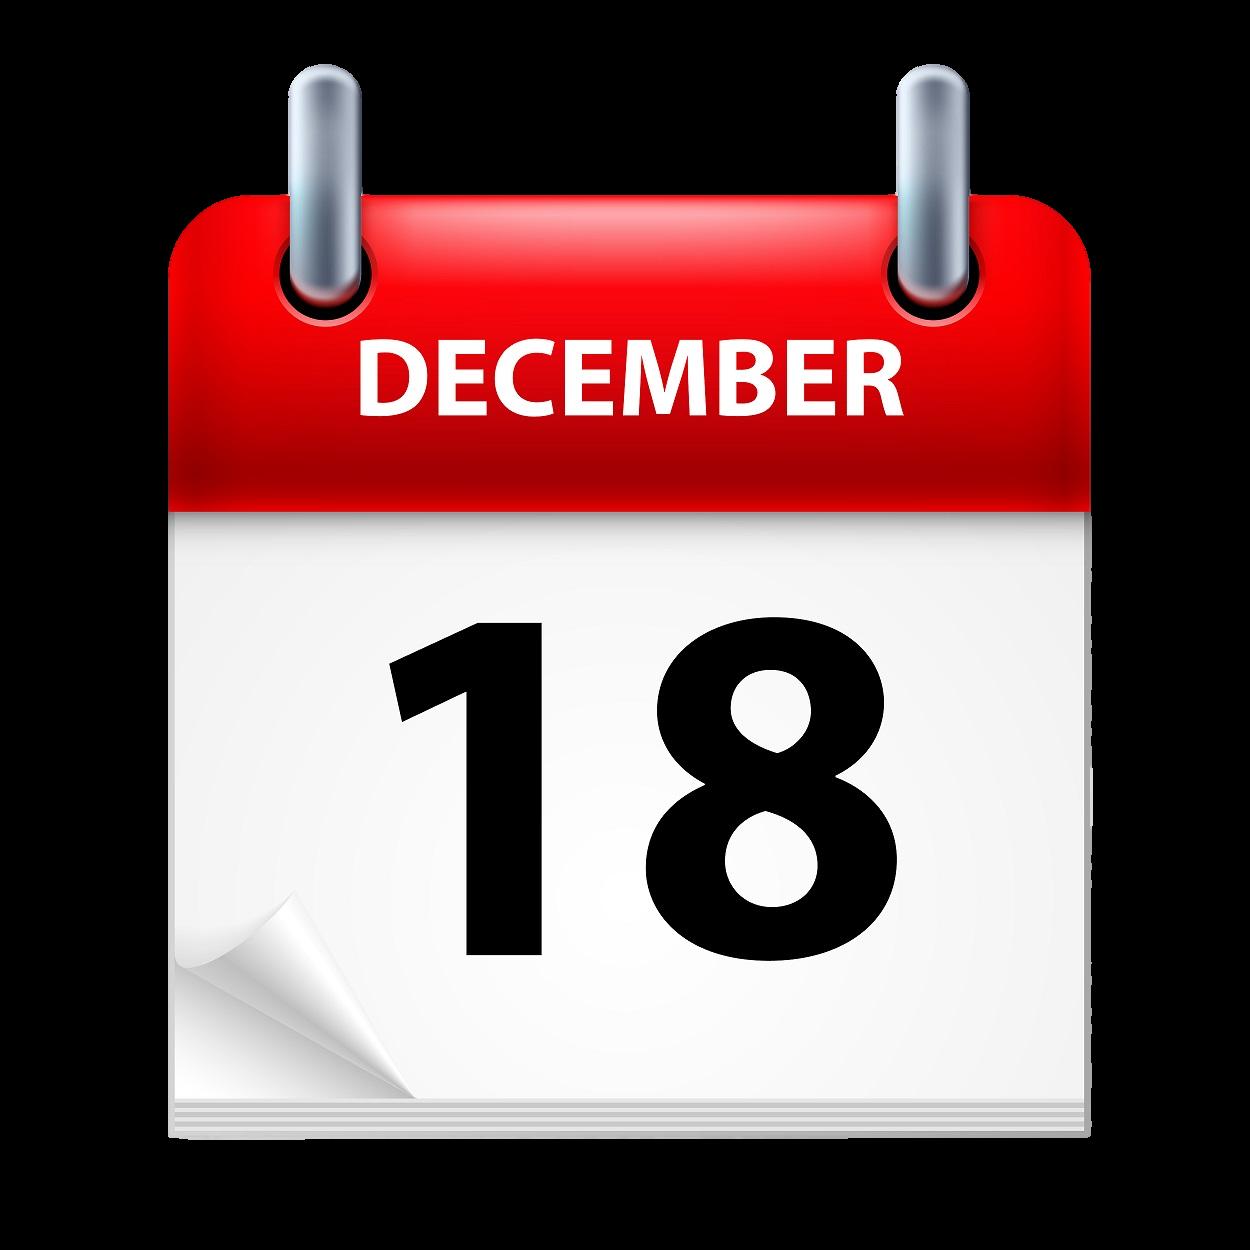 December date calendar clipart picture black and white download Calendar December Stock photography Clip art - dates 1250*1250 ... picture black and white download